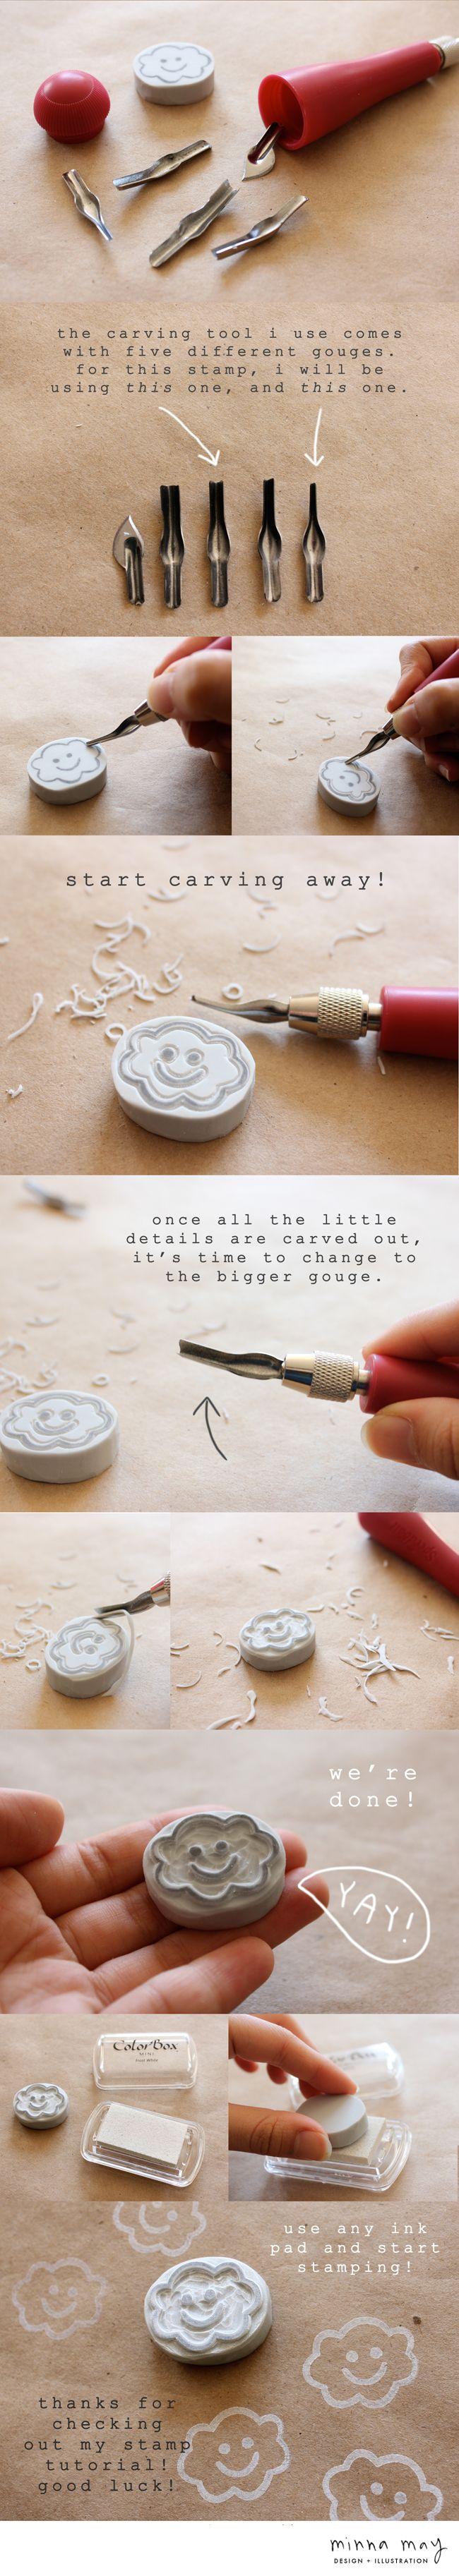 hand carved stamp tutorial - minna may | design + illustration